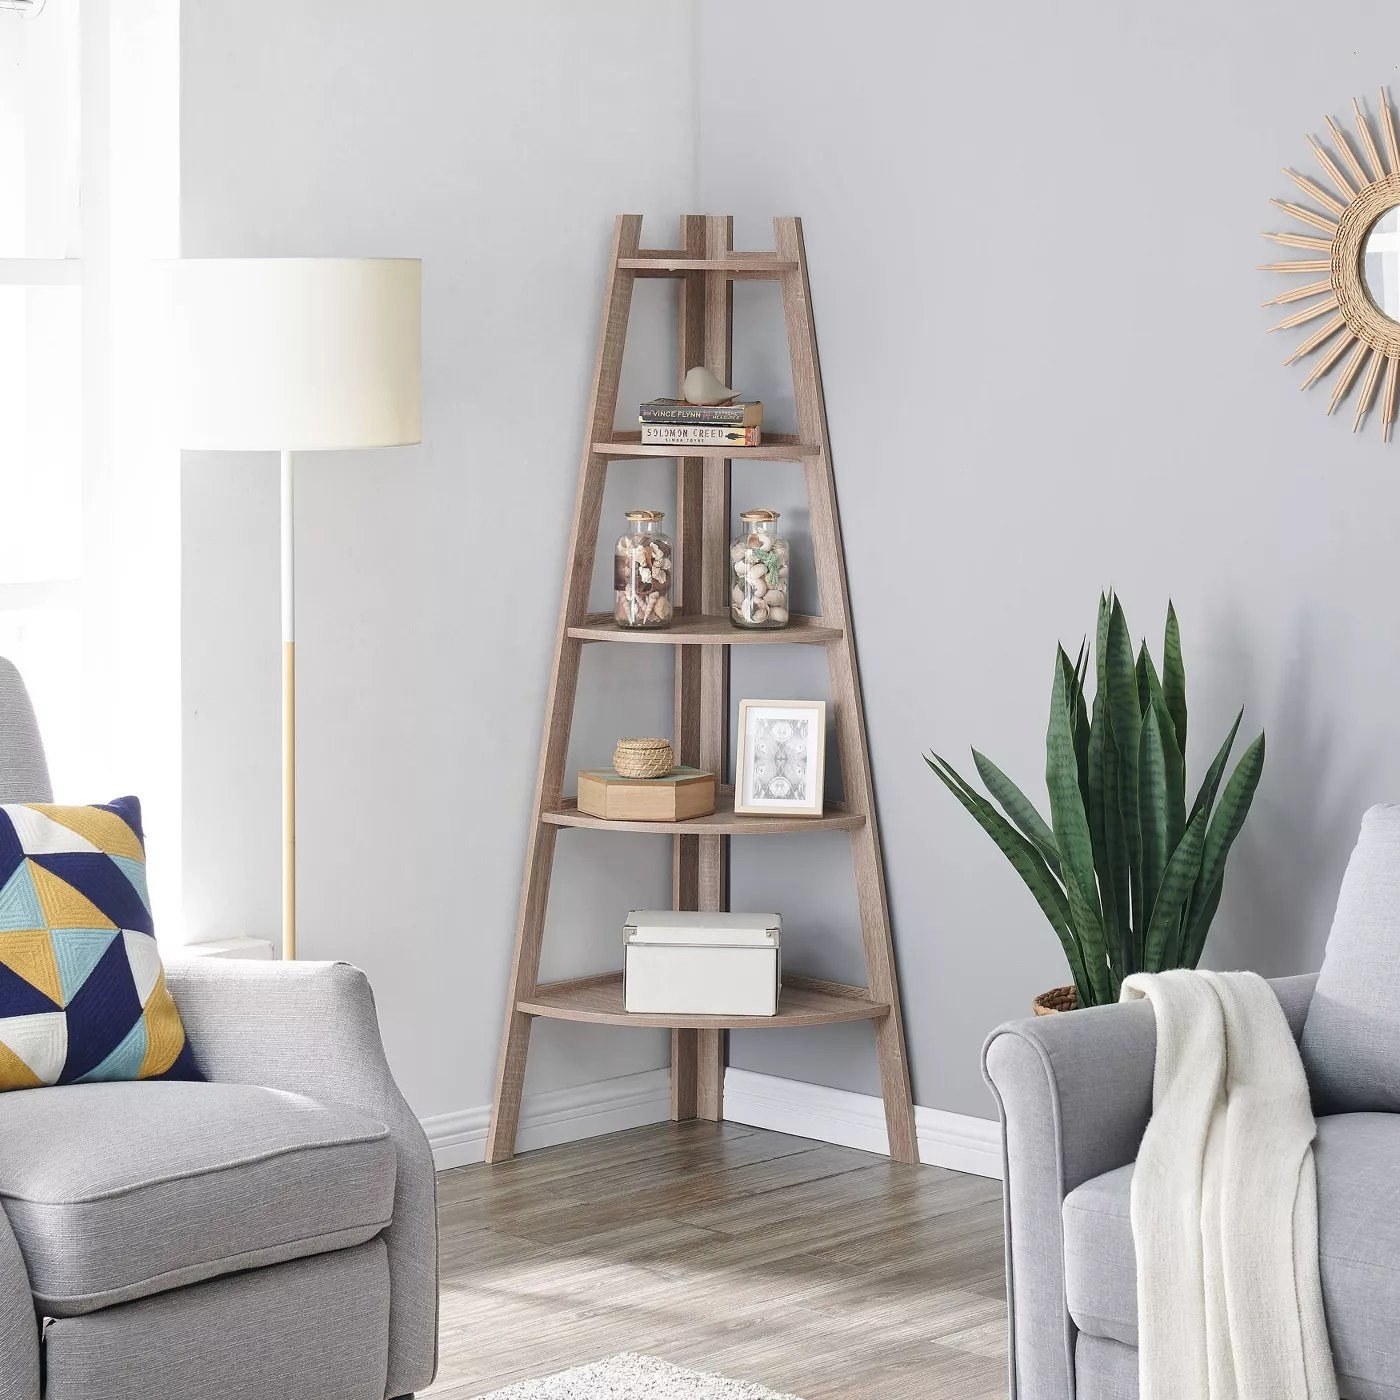 A corner shelf